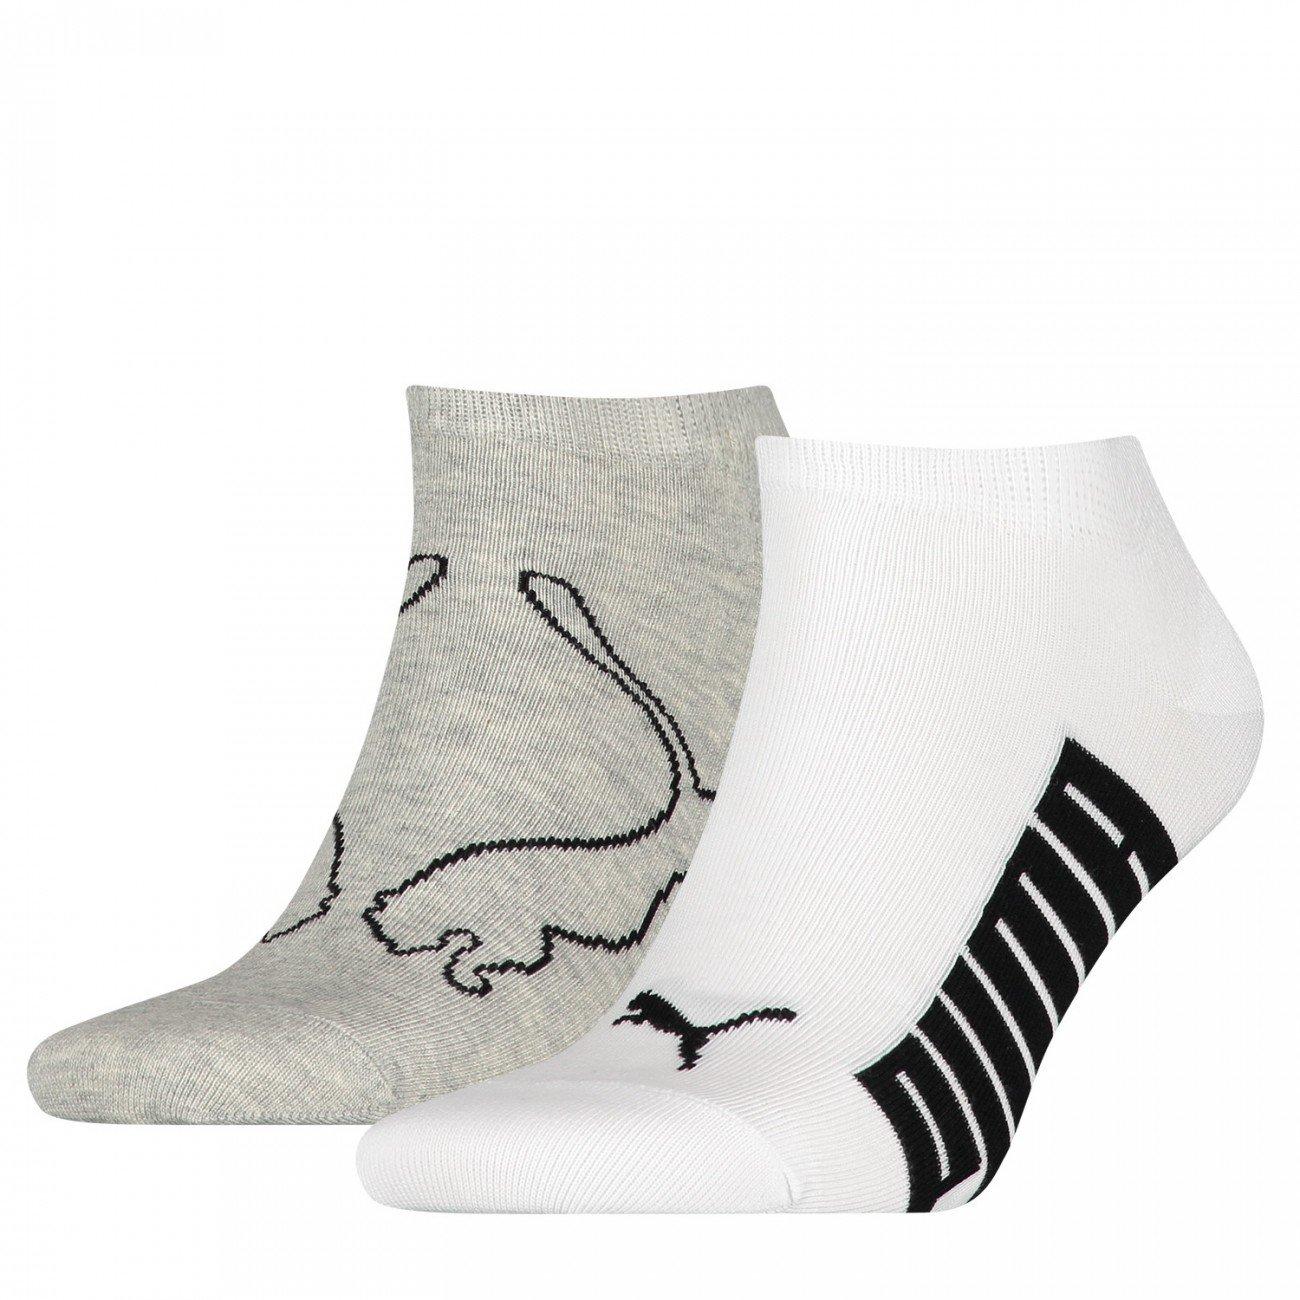 PUMA Unisex Sneaker calzini Winner 4er Pack